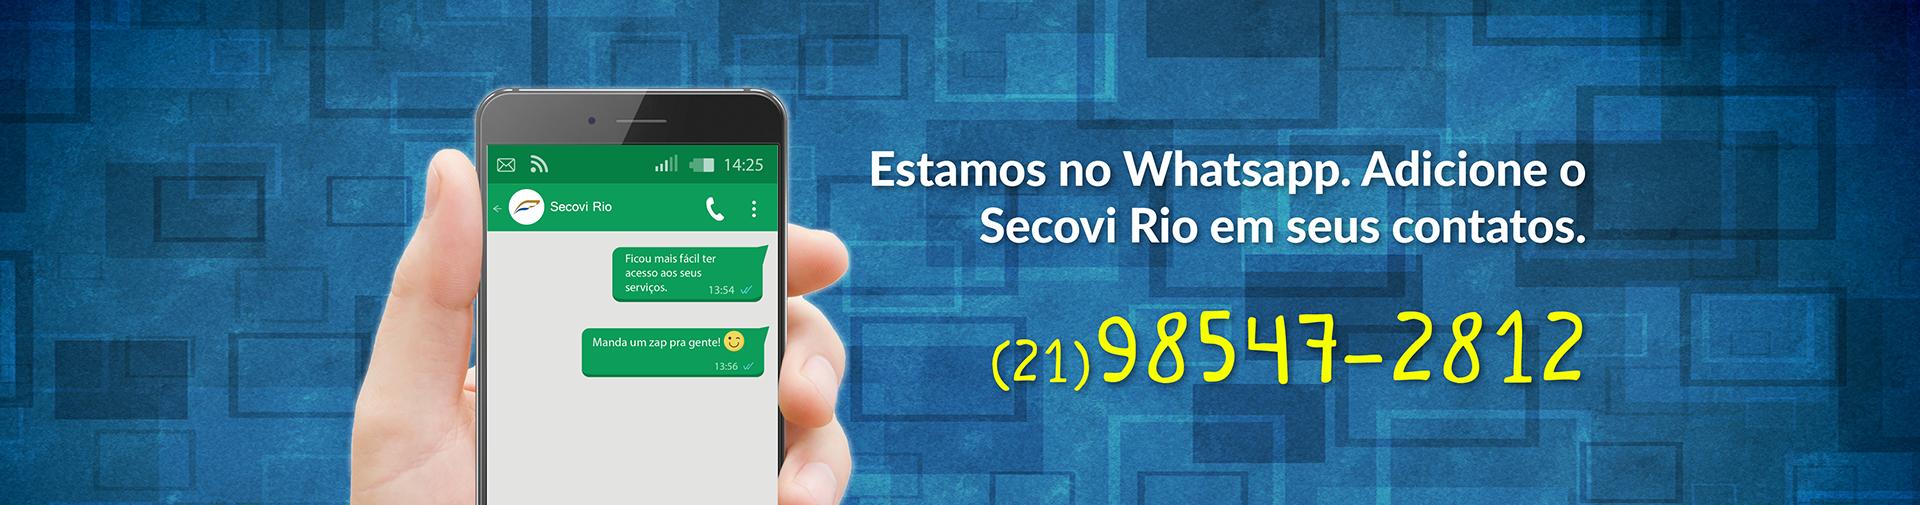 Secovi Rio Whatsapp